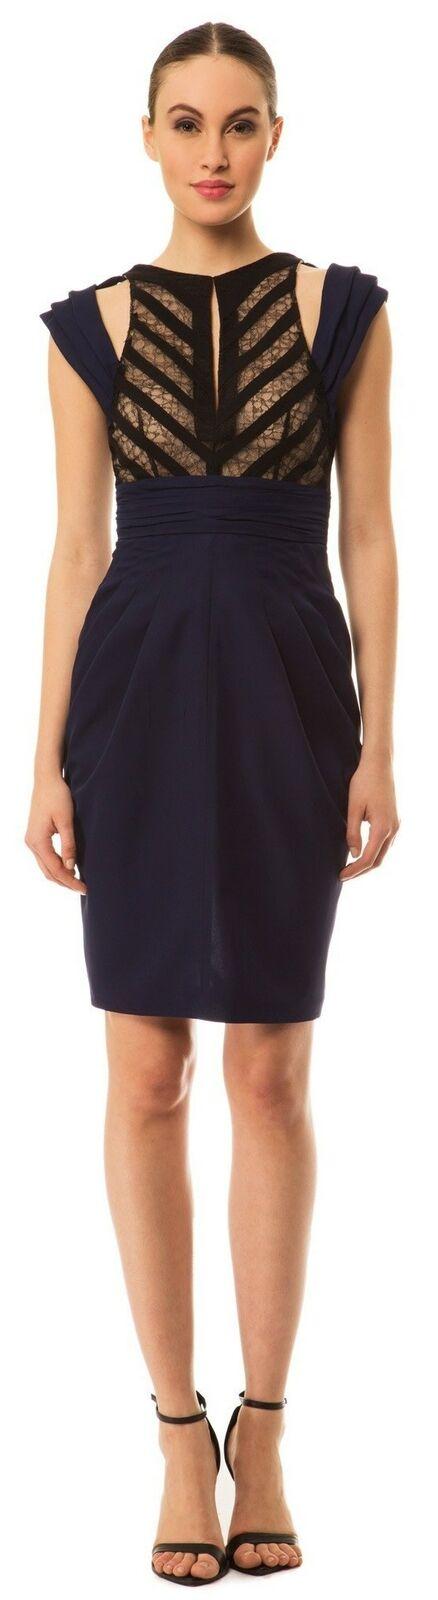 CATHERINE MALANDRINO Blau schwarz lace cutout shoulder dress SZ 4